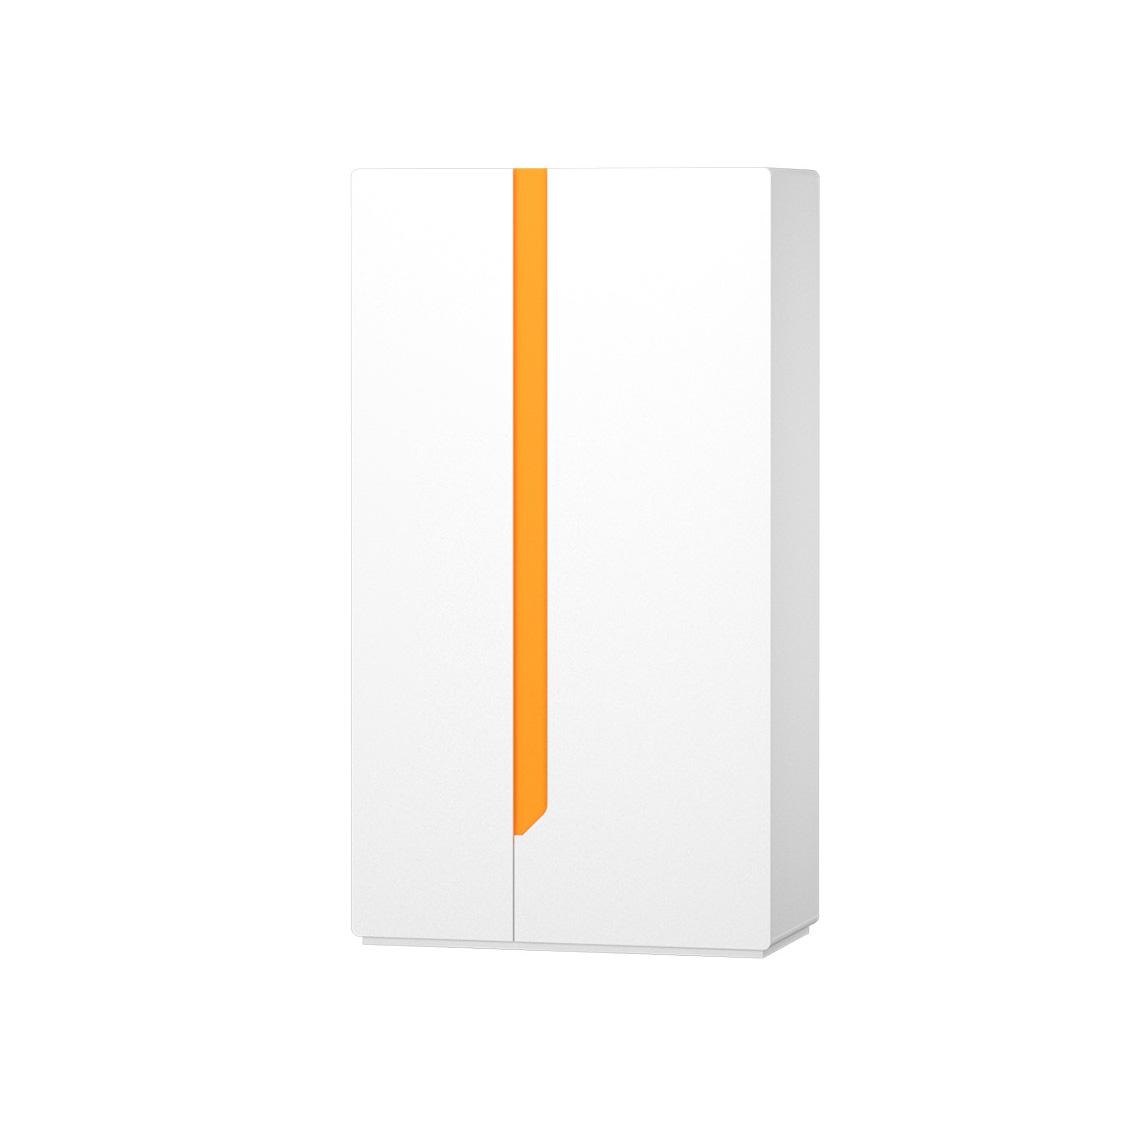 Bianco / Bianco / Arancione